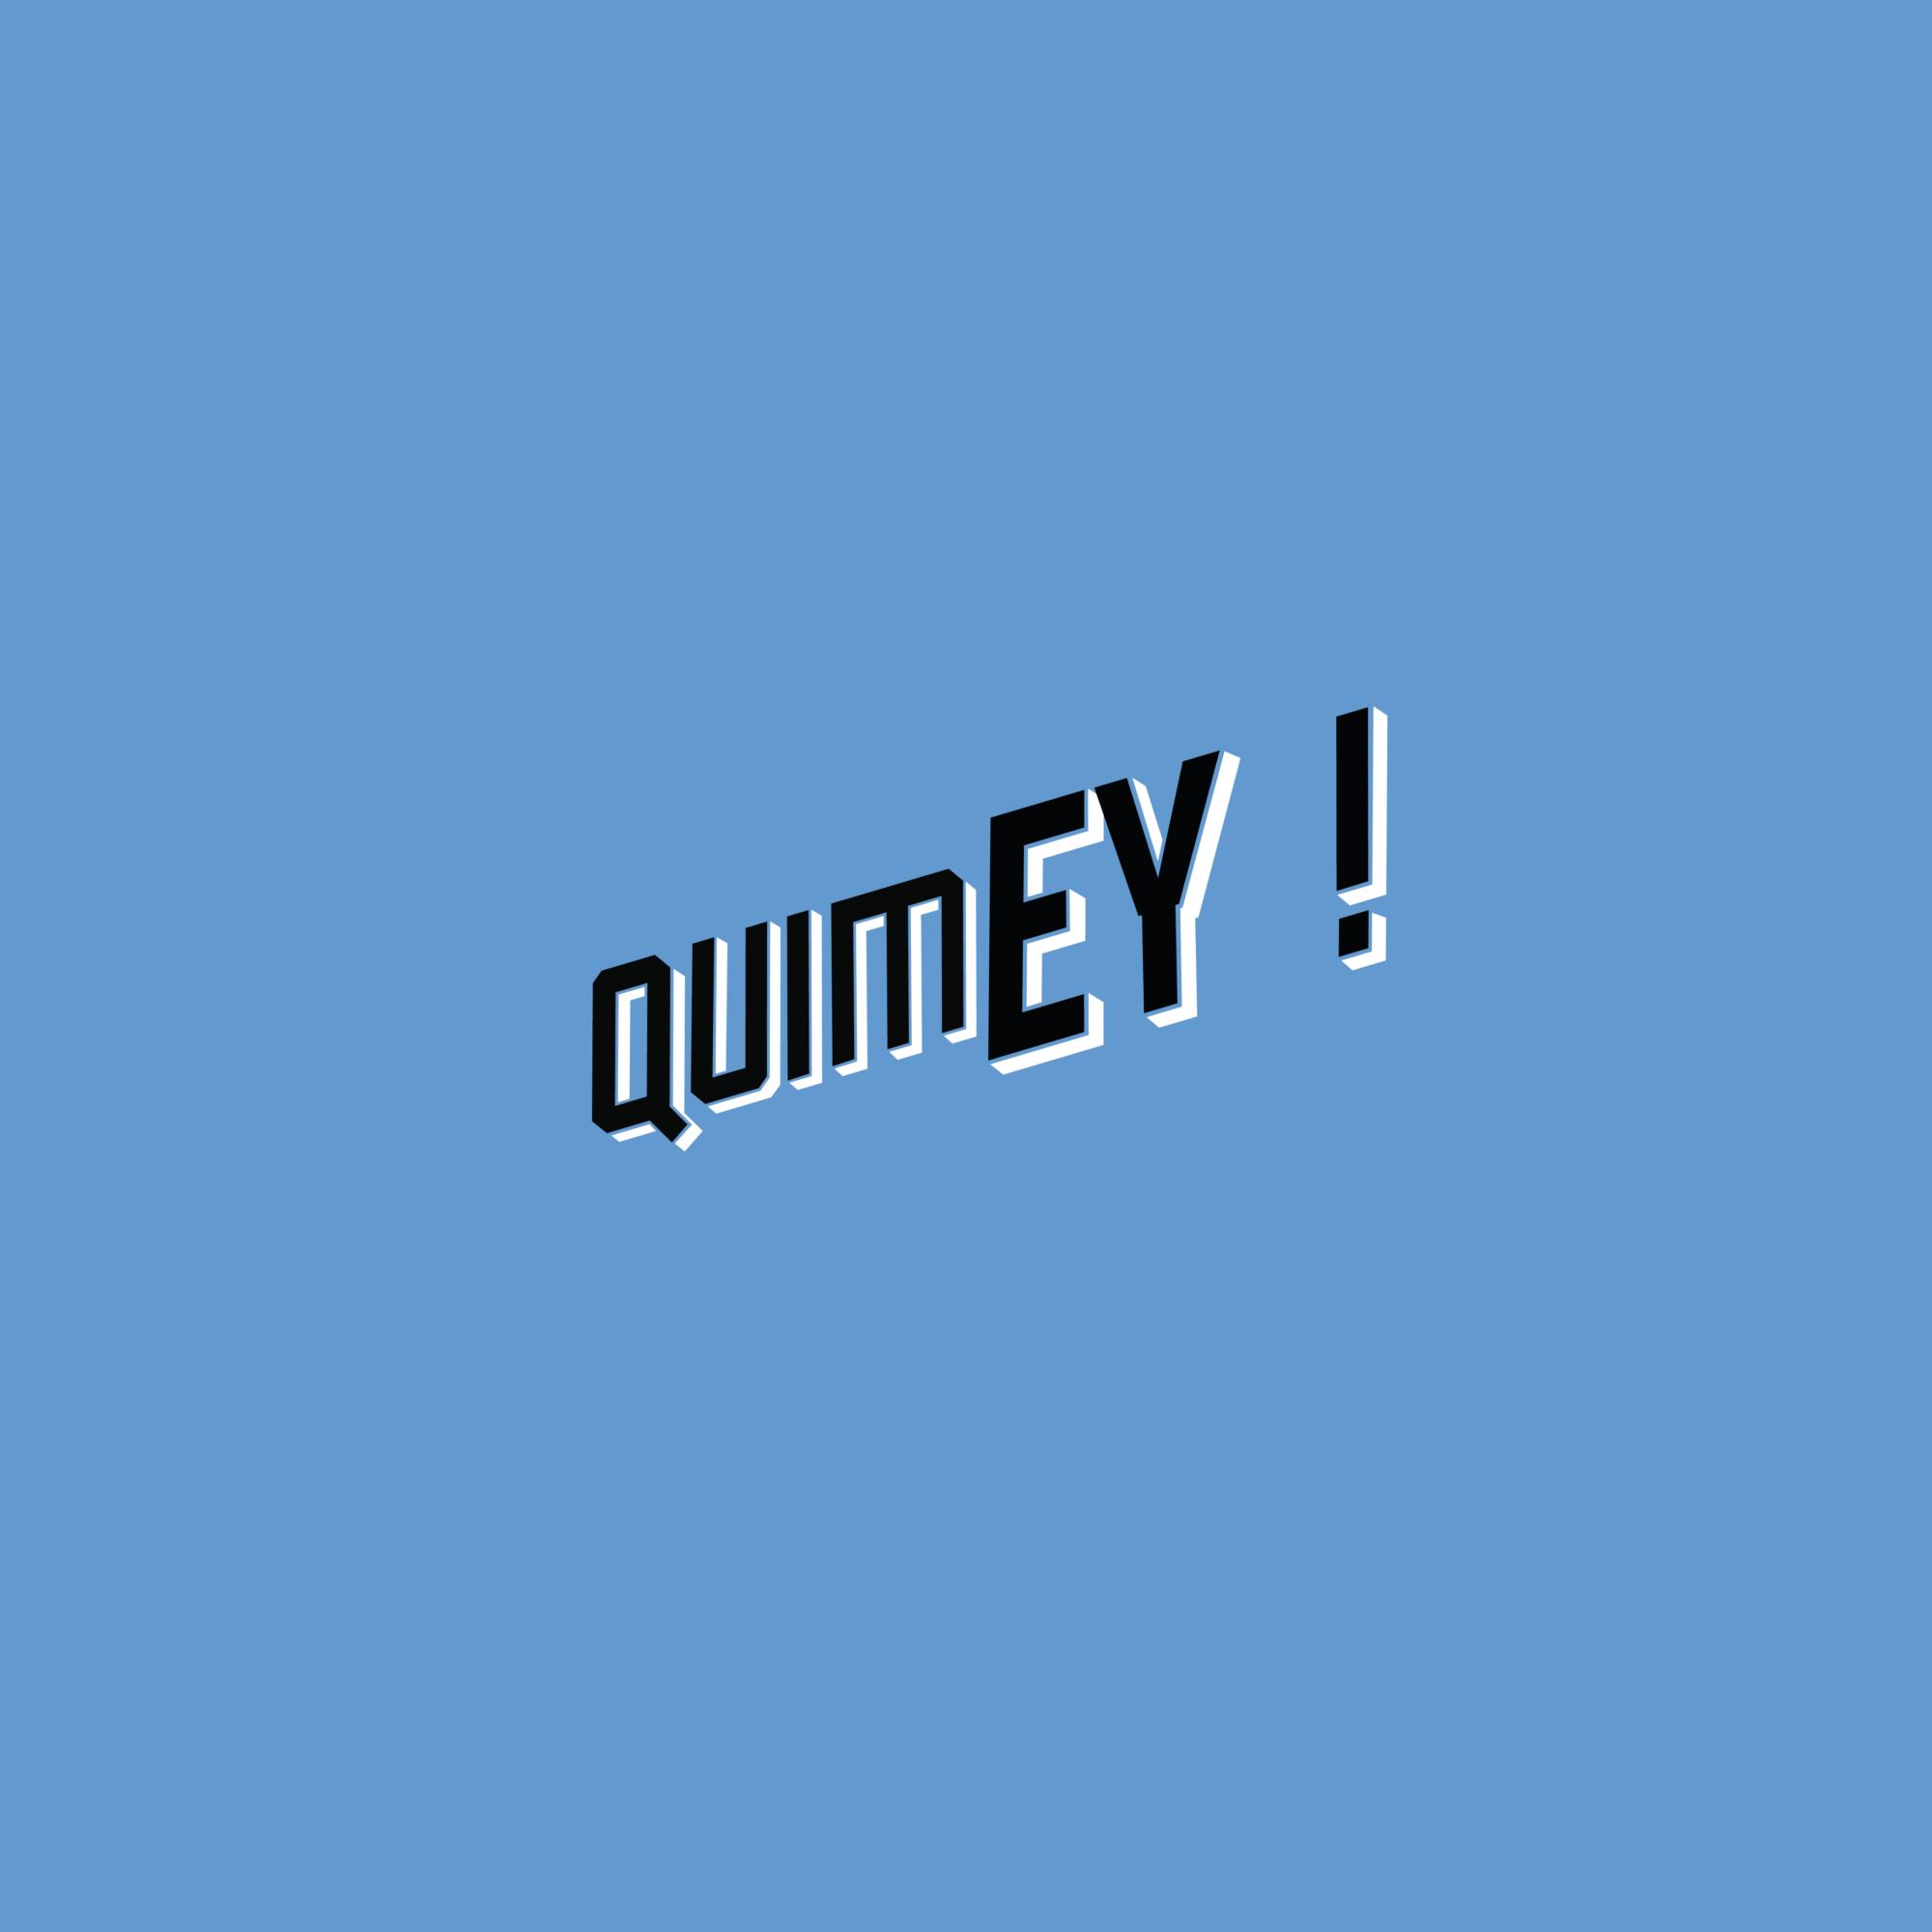 quimey-1@3x